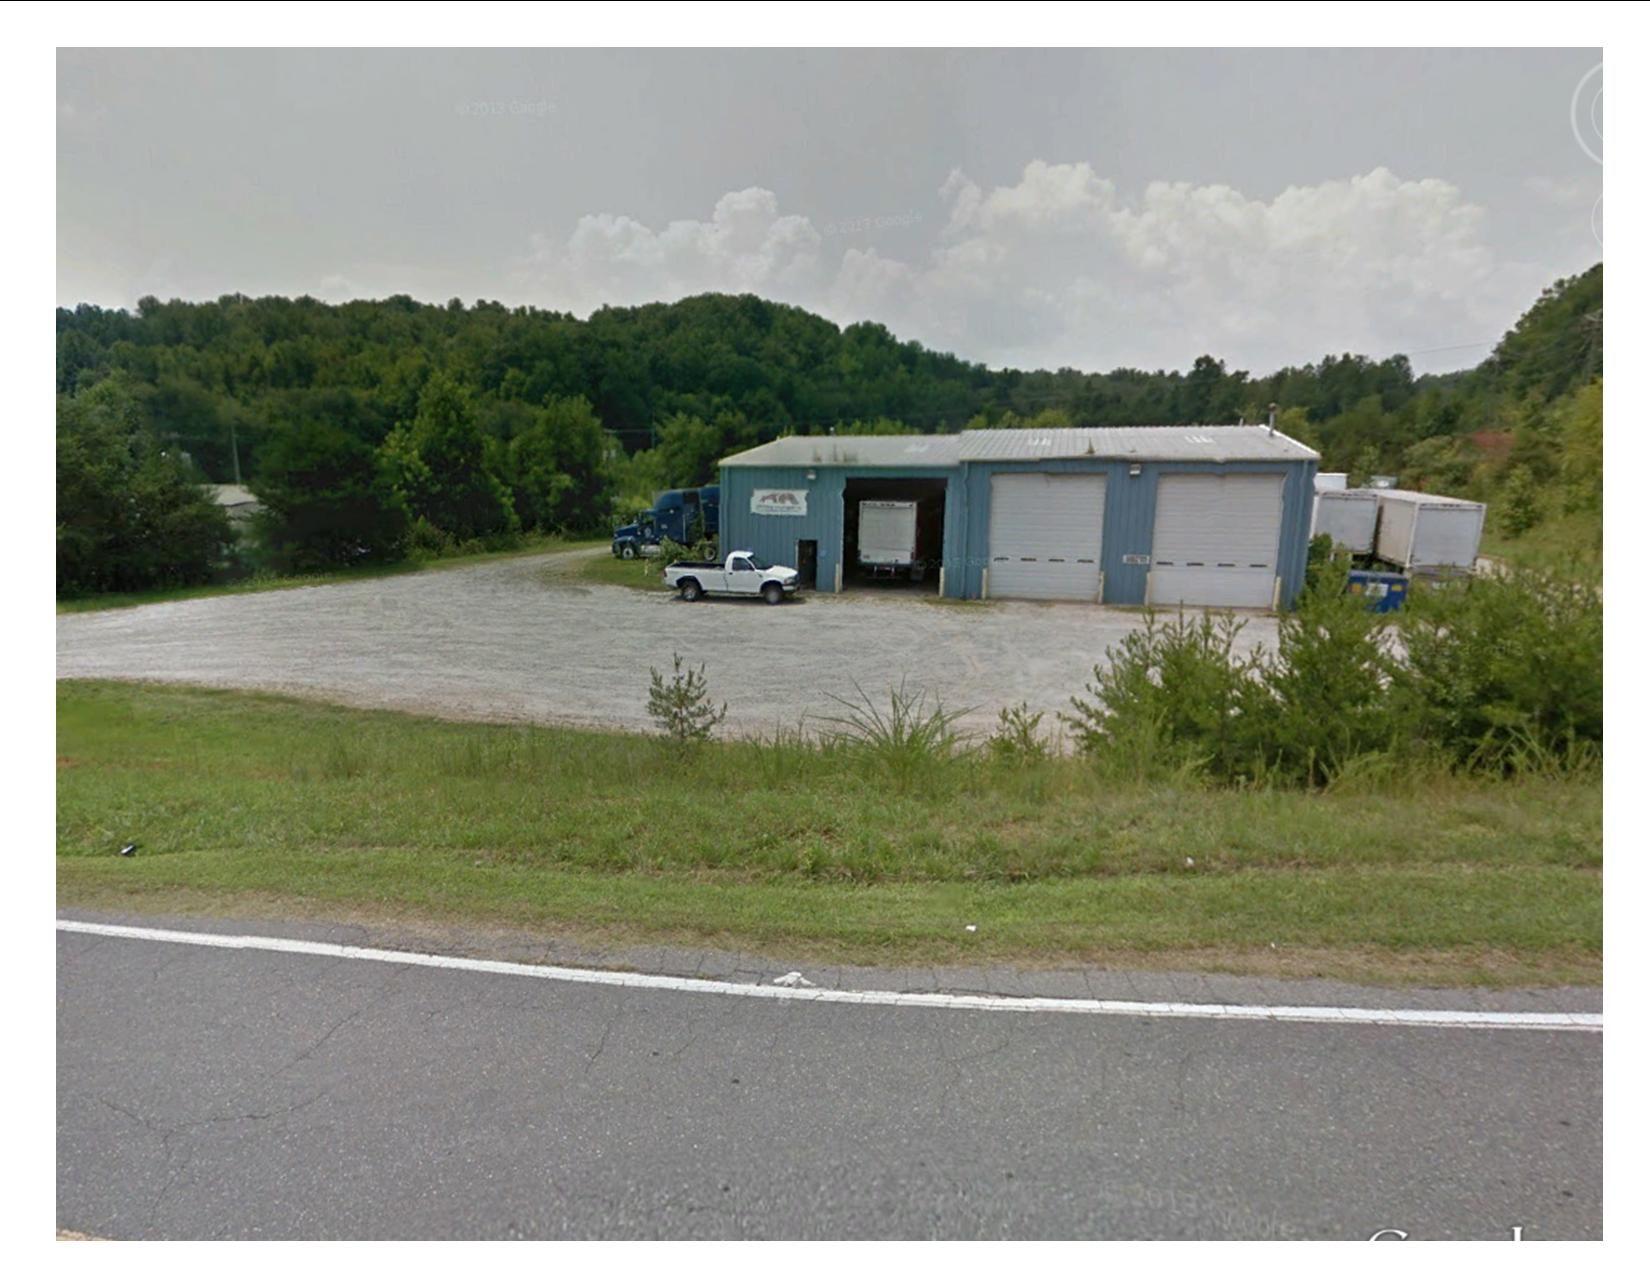 Garage For Service Trucks : Truck service garage reep dr morganton nc